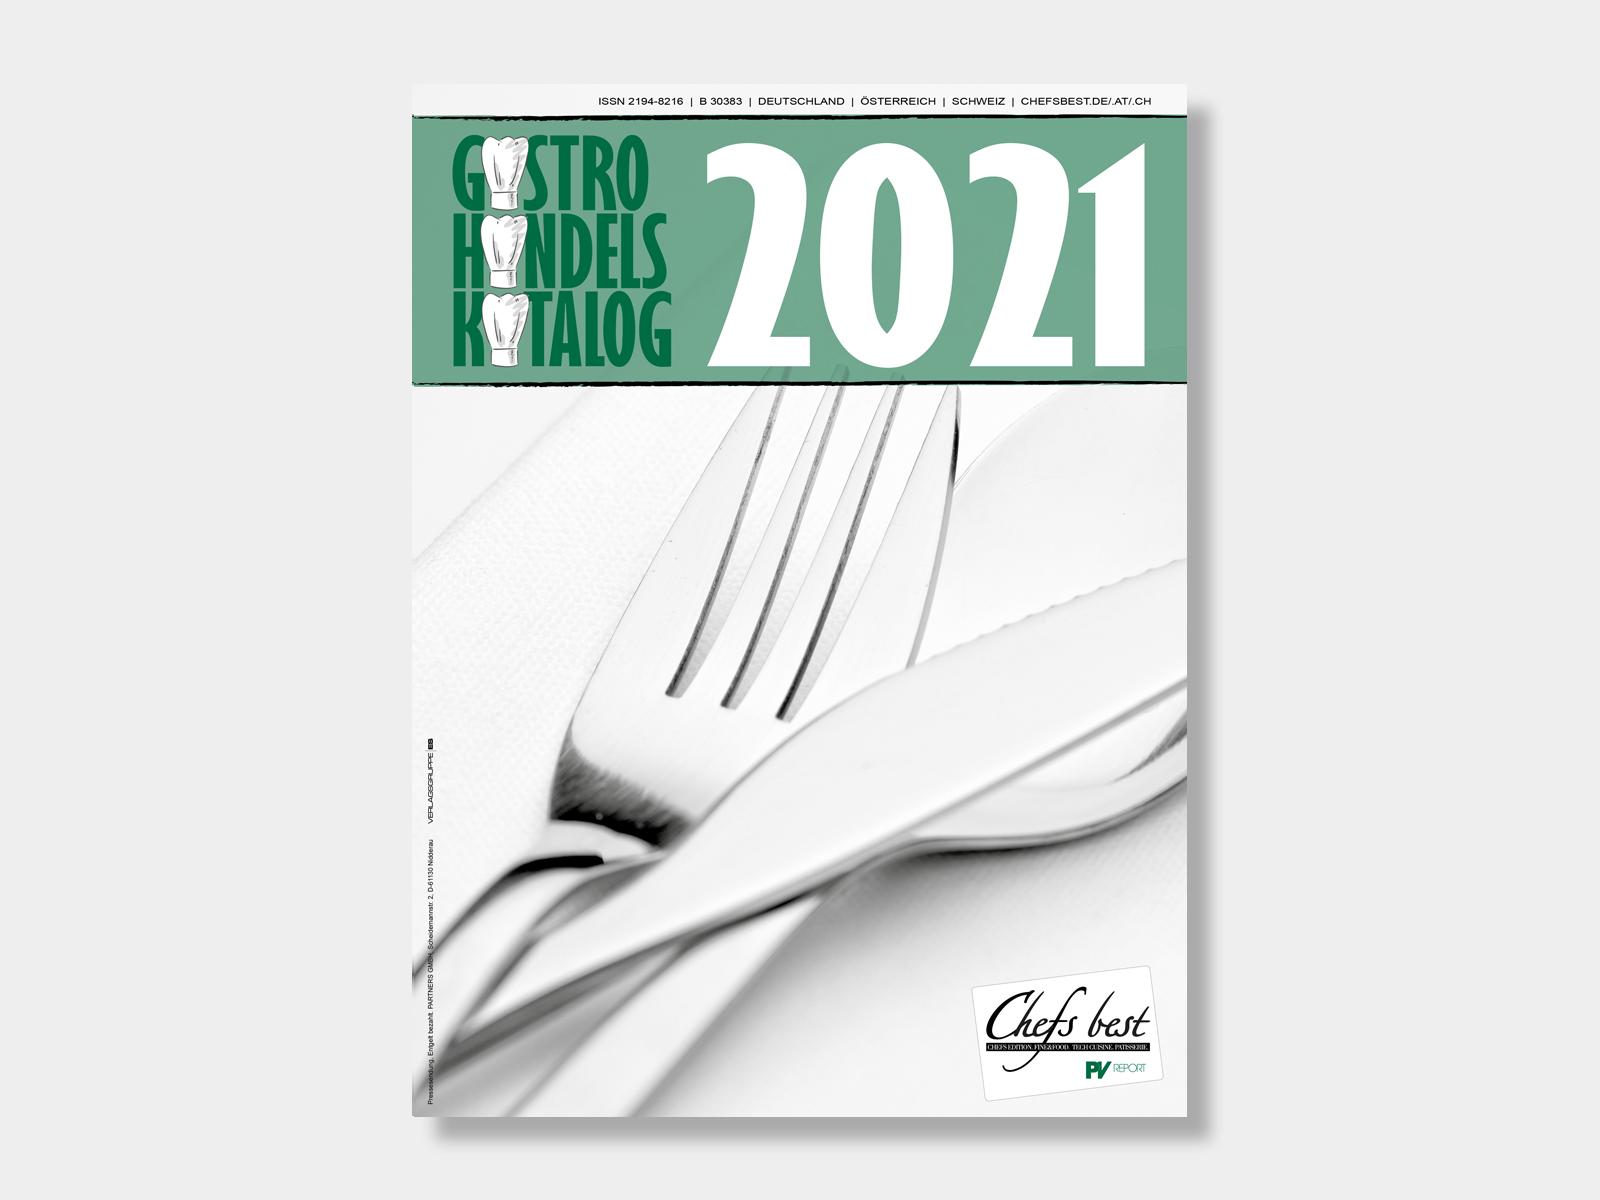 Gastro Handels Katalog